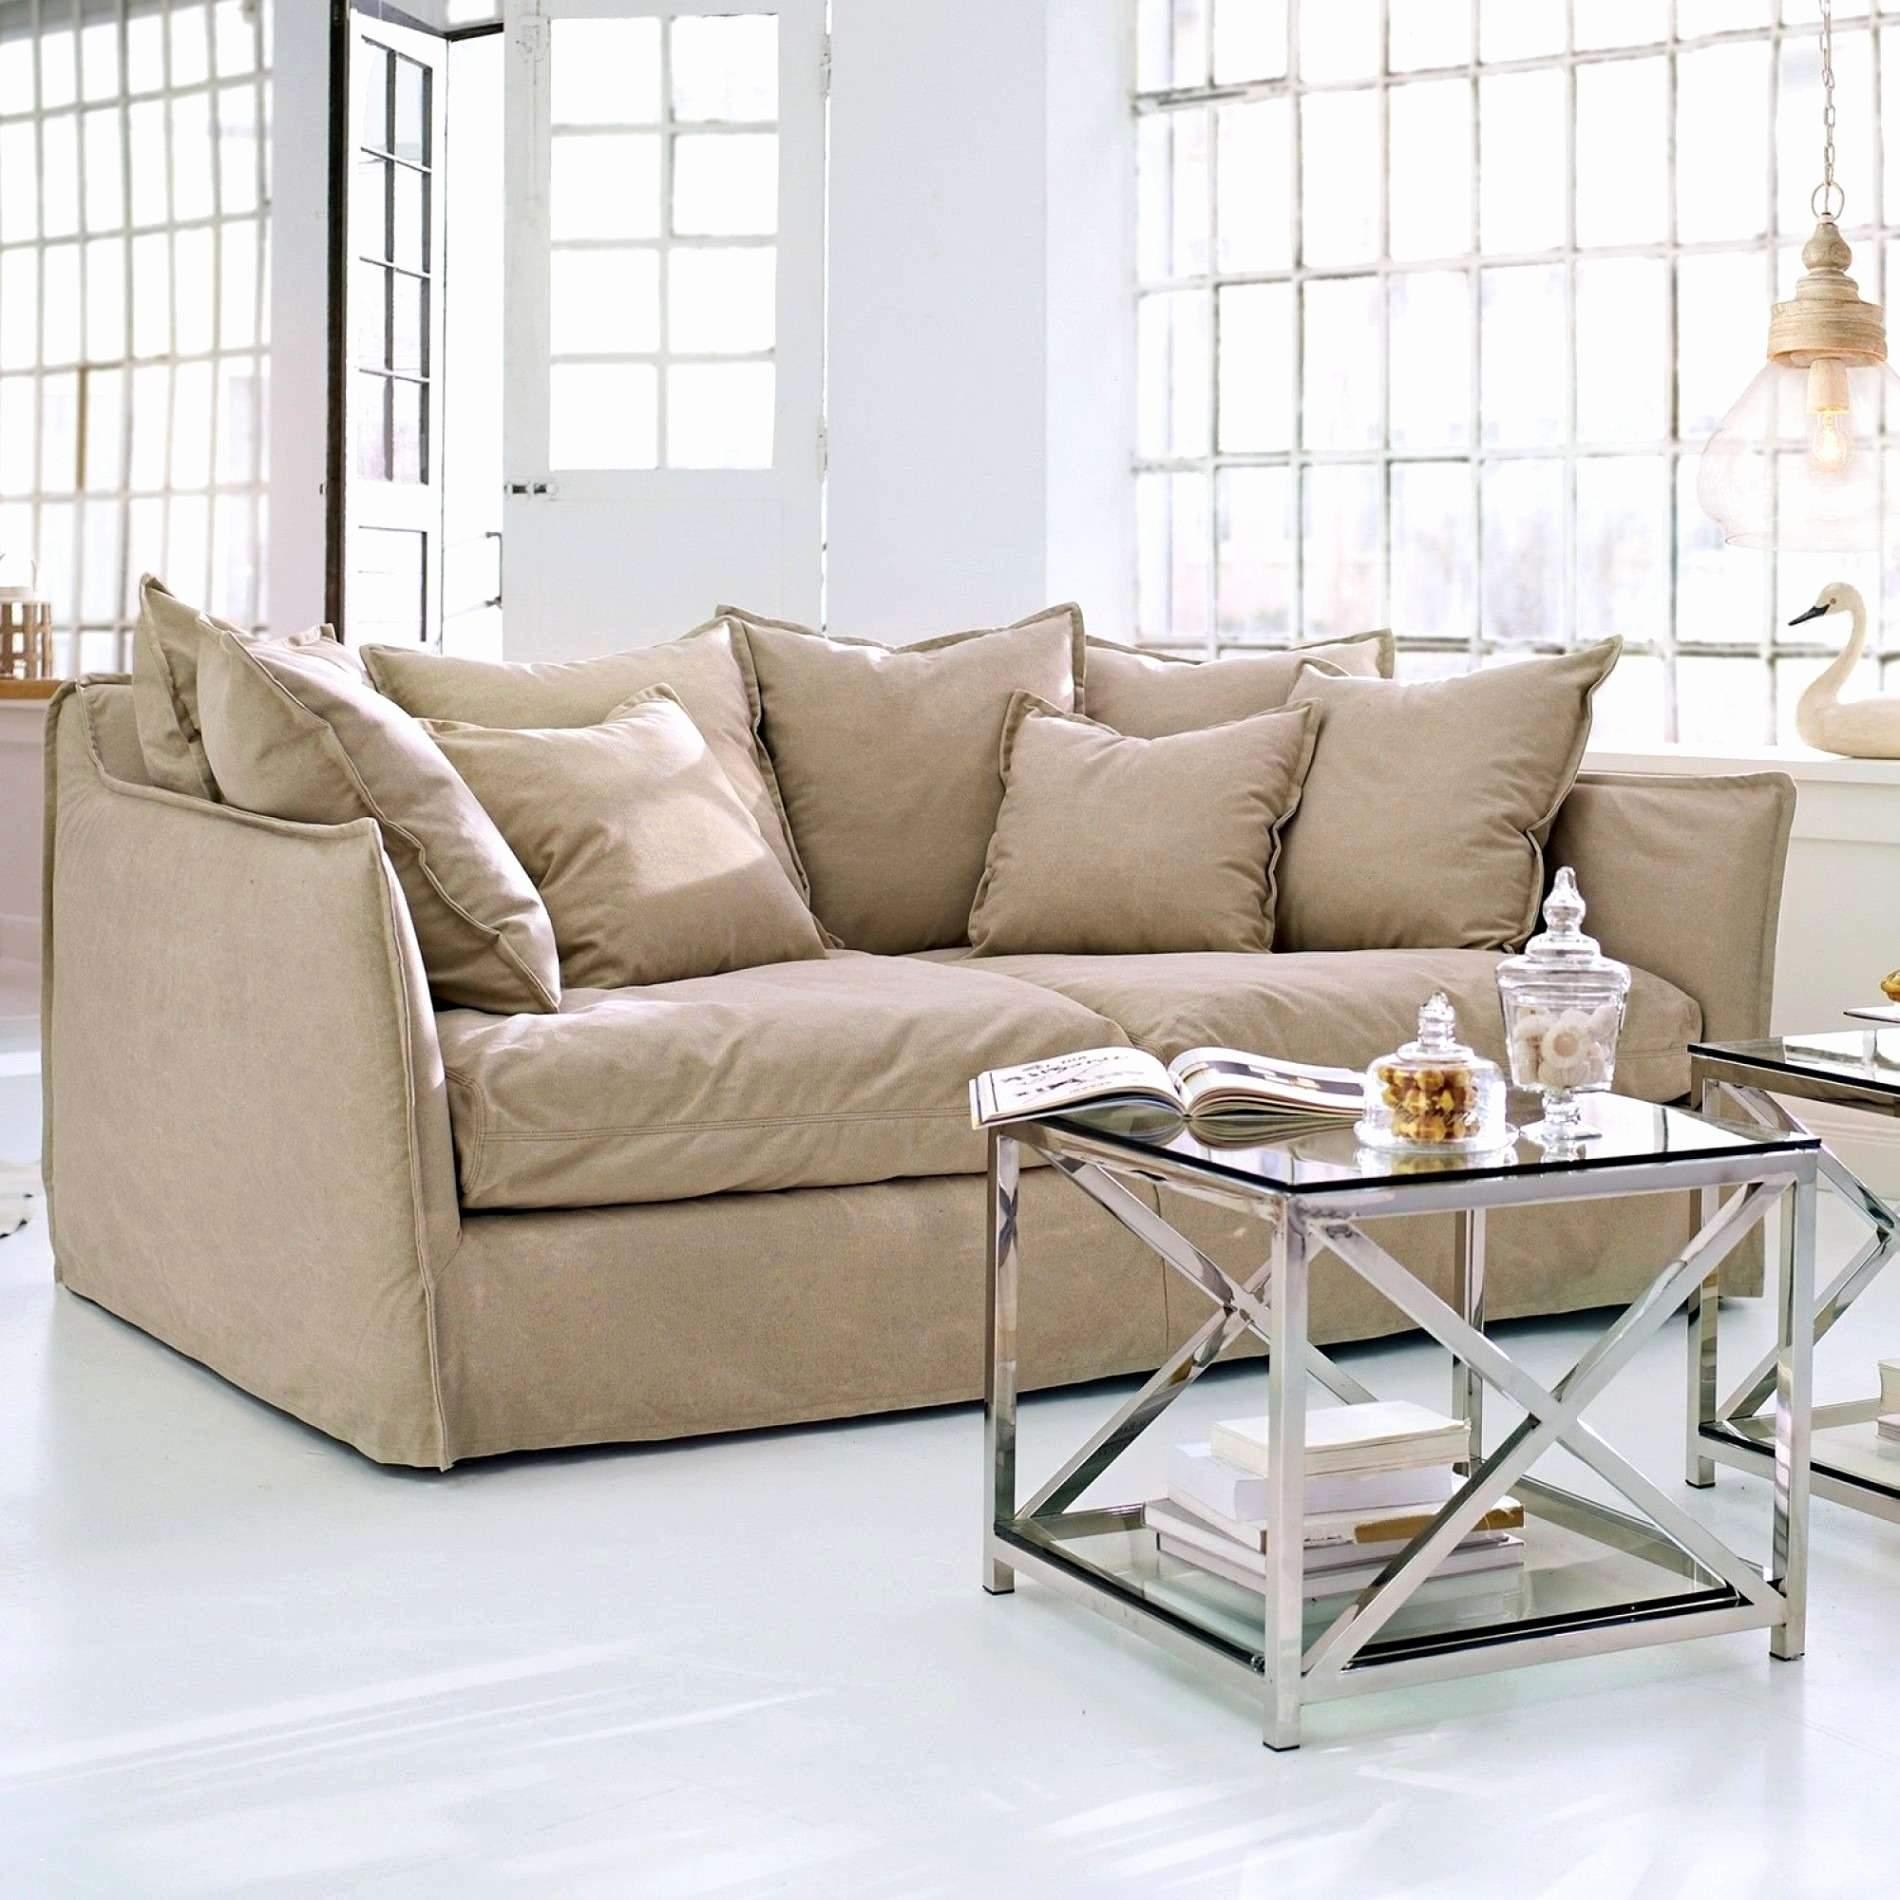 lounge sofa wohnzimmer einzigartig lounge sofa wohnzimmer reizend 44 schon lounge sofa leder of lounge sofa wohnzimmer